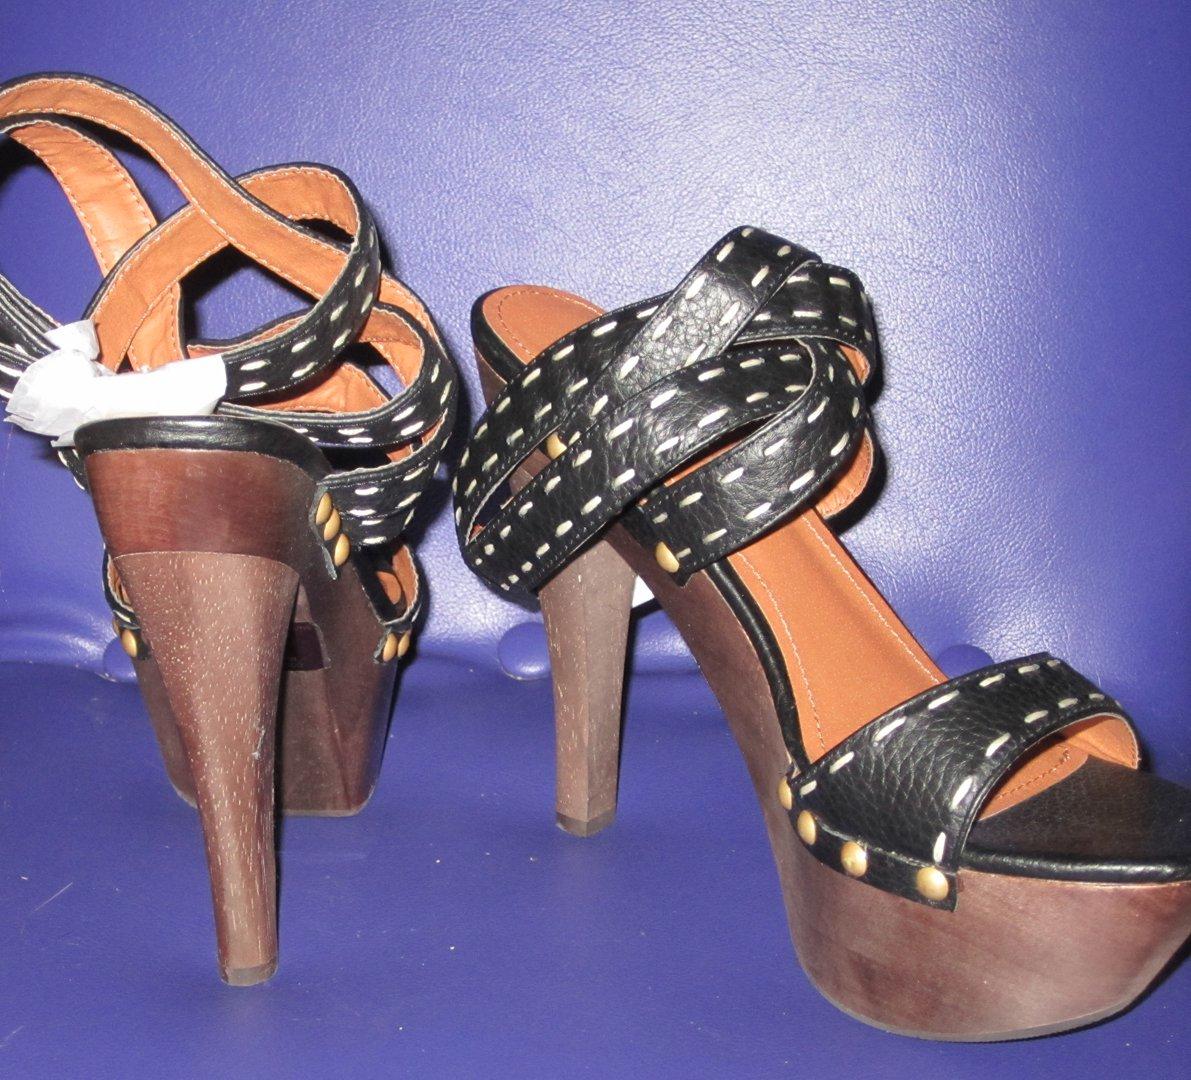 NIB Victoria's Secret $95 Black Leather Anklestrap Wood Platform Sandals 8.5 265814